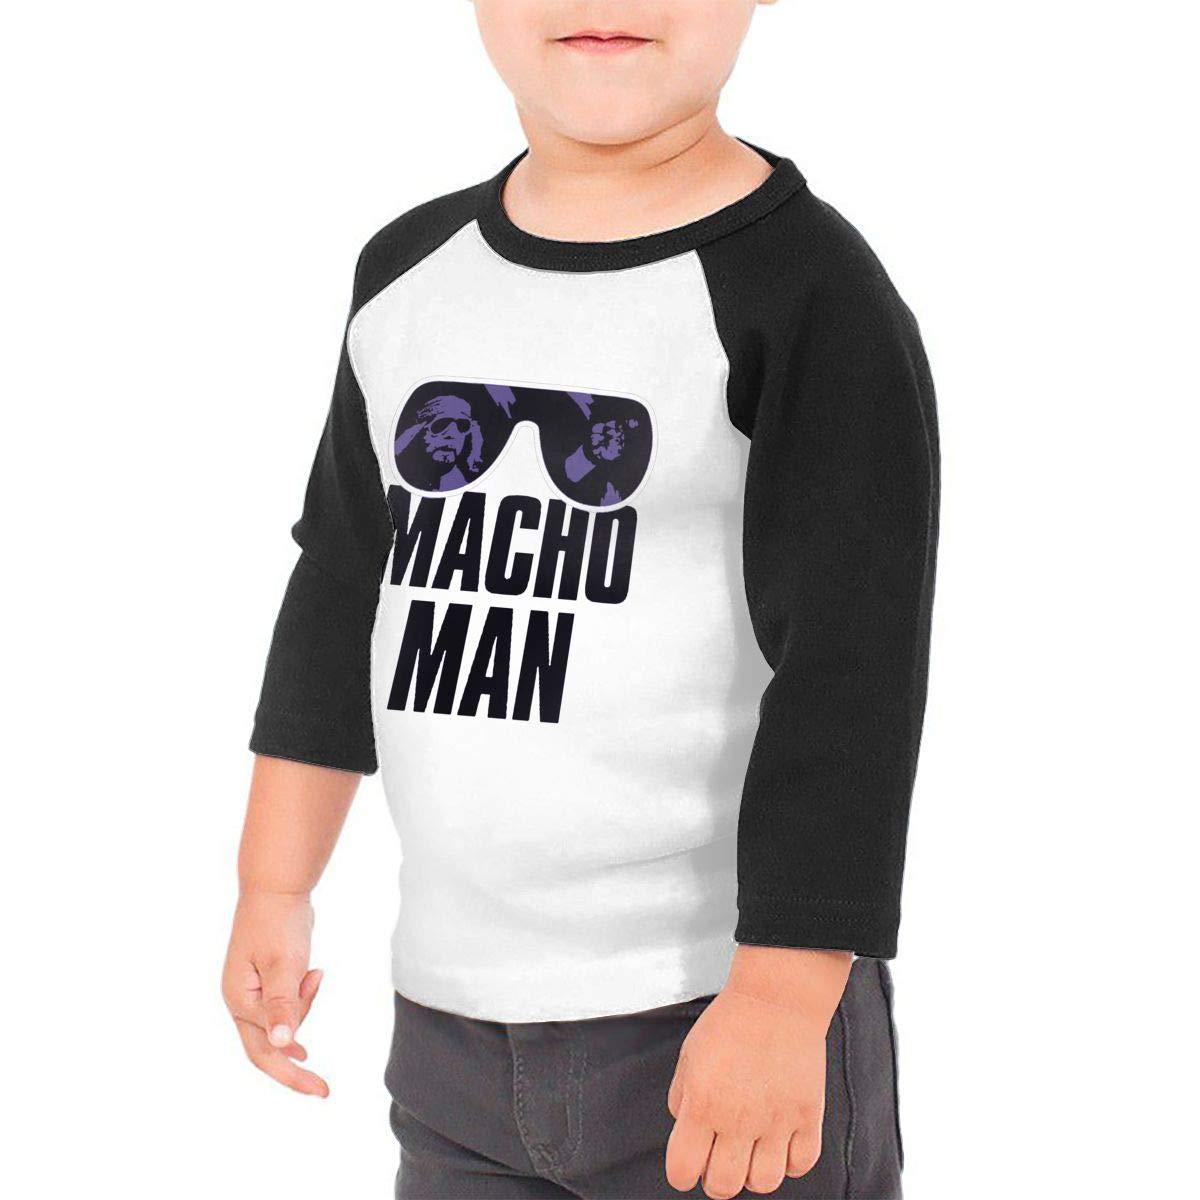 yimo Macho Man Unisex Toddler Baseball Jersey Contrast 3//4 Sleeves Tee